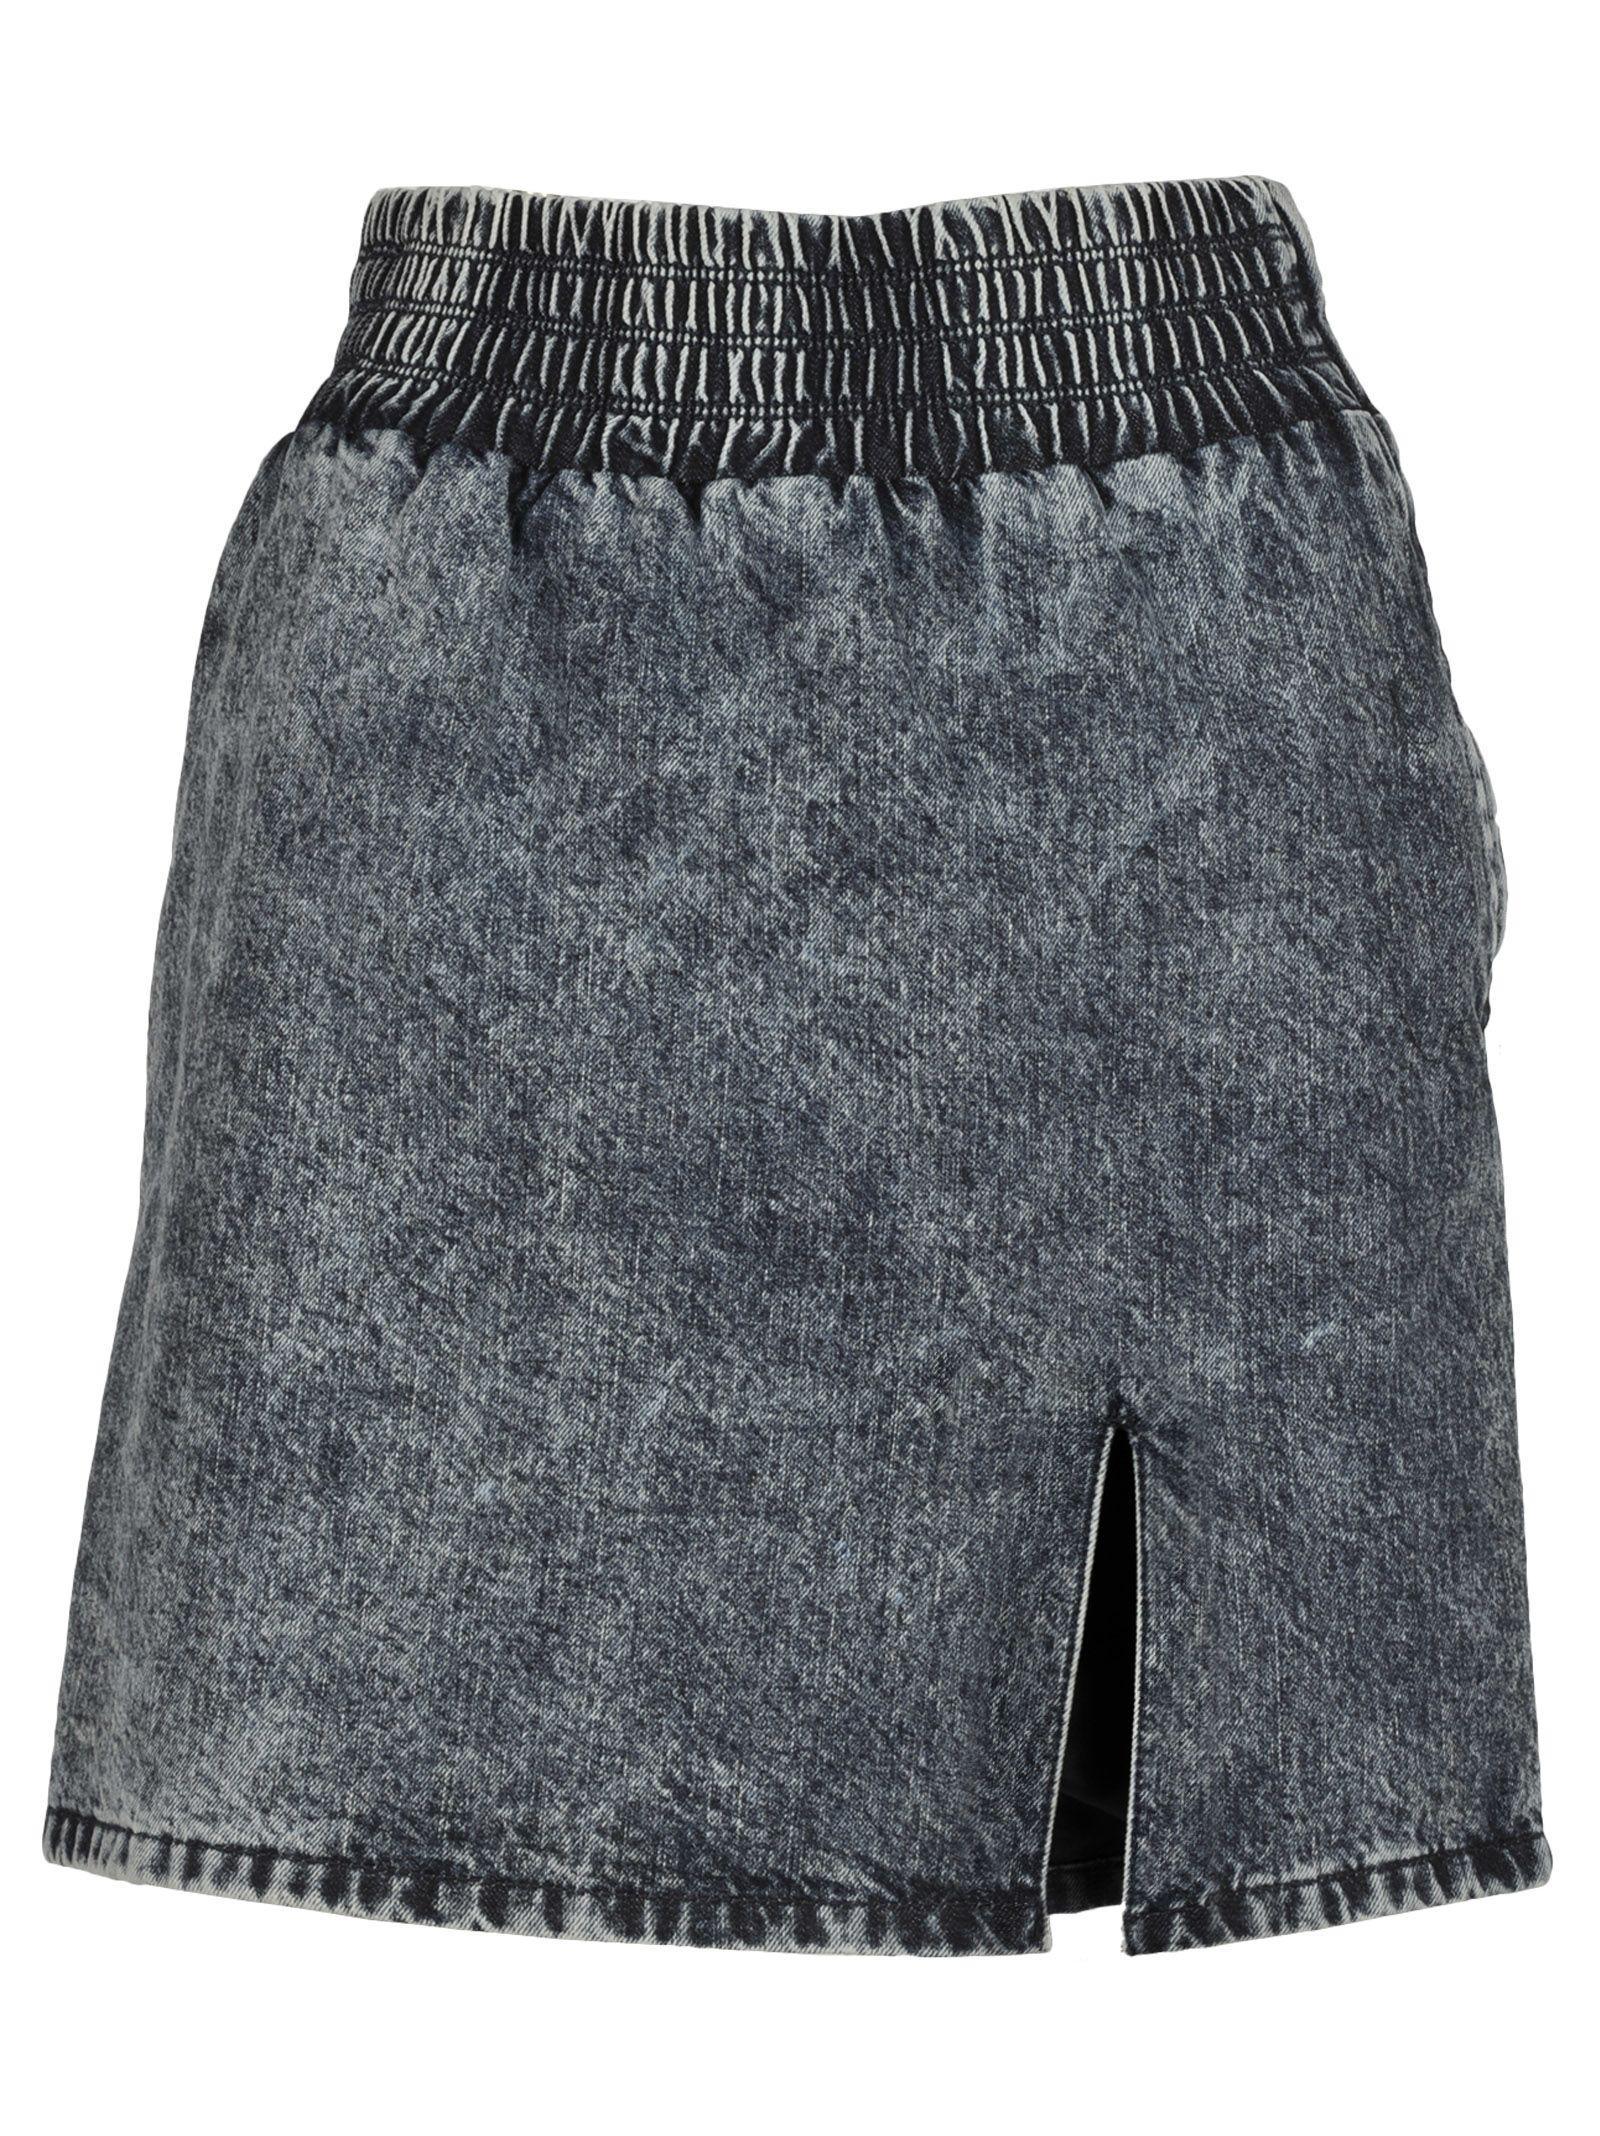 d05d7eb8a Miu Miu Acid Wash Denim Mini Skirt In F0008 Blue | ModeSens